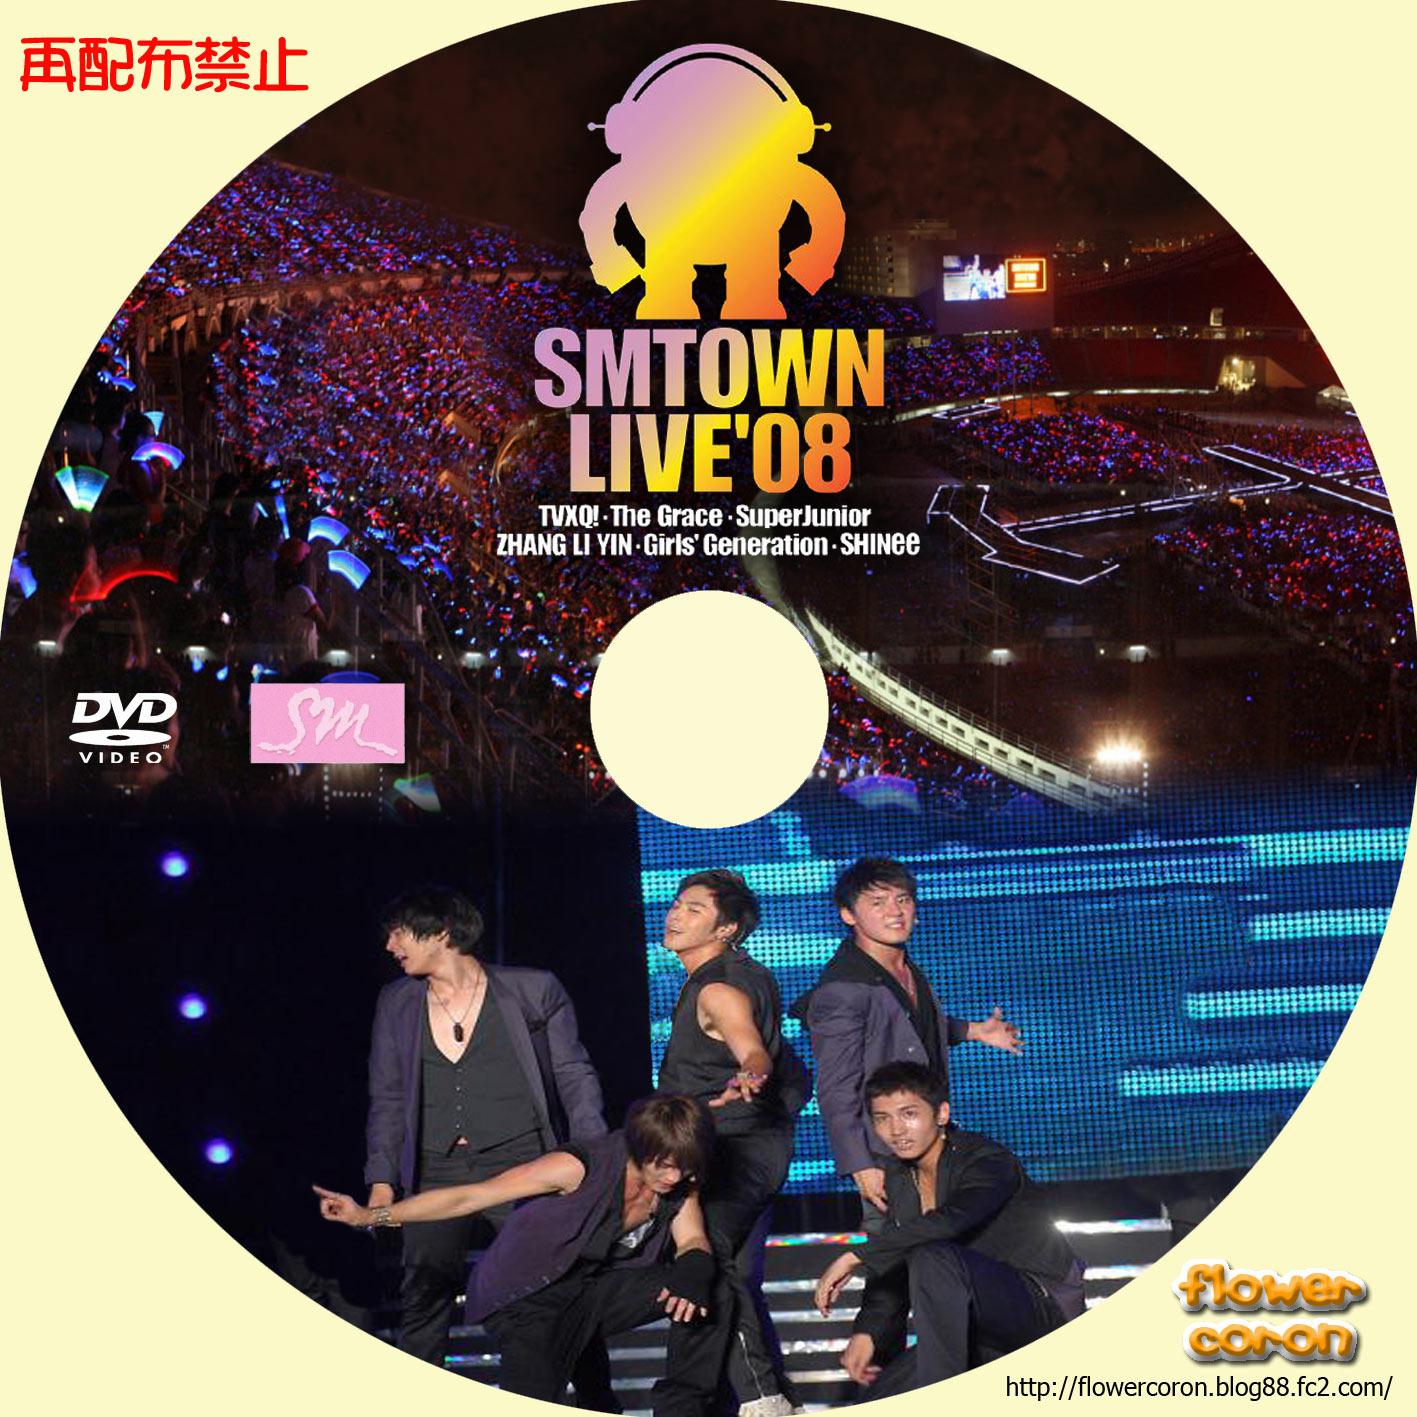 SMTOWN LIVE08